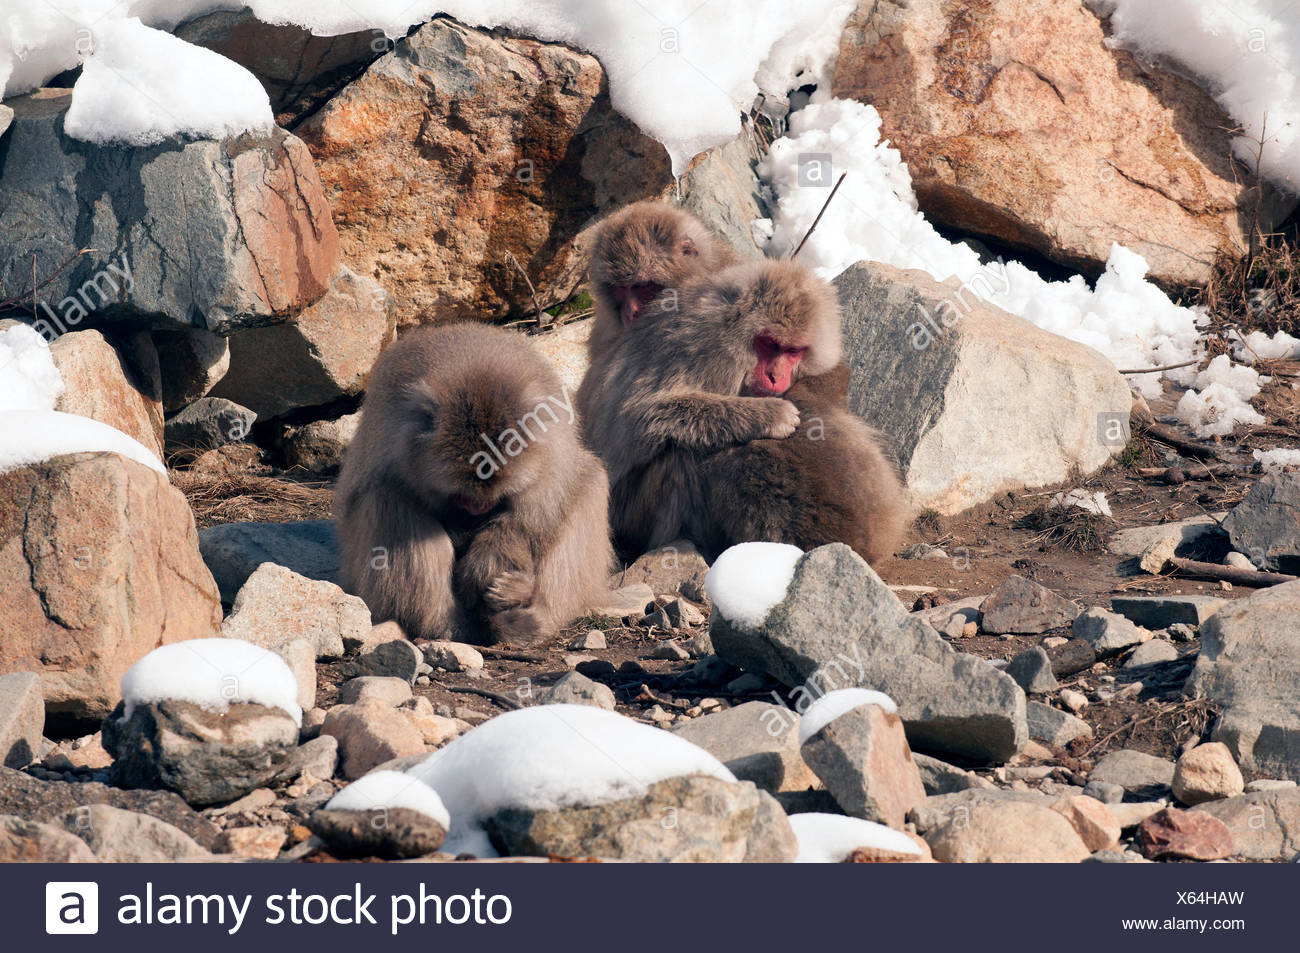 Japanese macaque or snow japanese monkey (Macaca fuscata), sleeping family, Japan Stock Photo